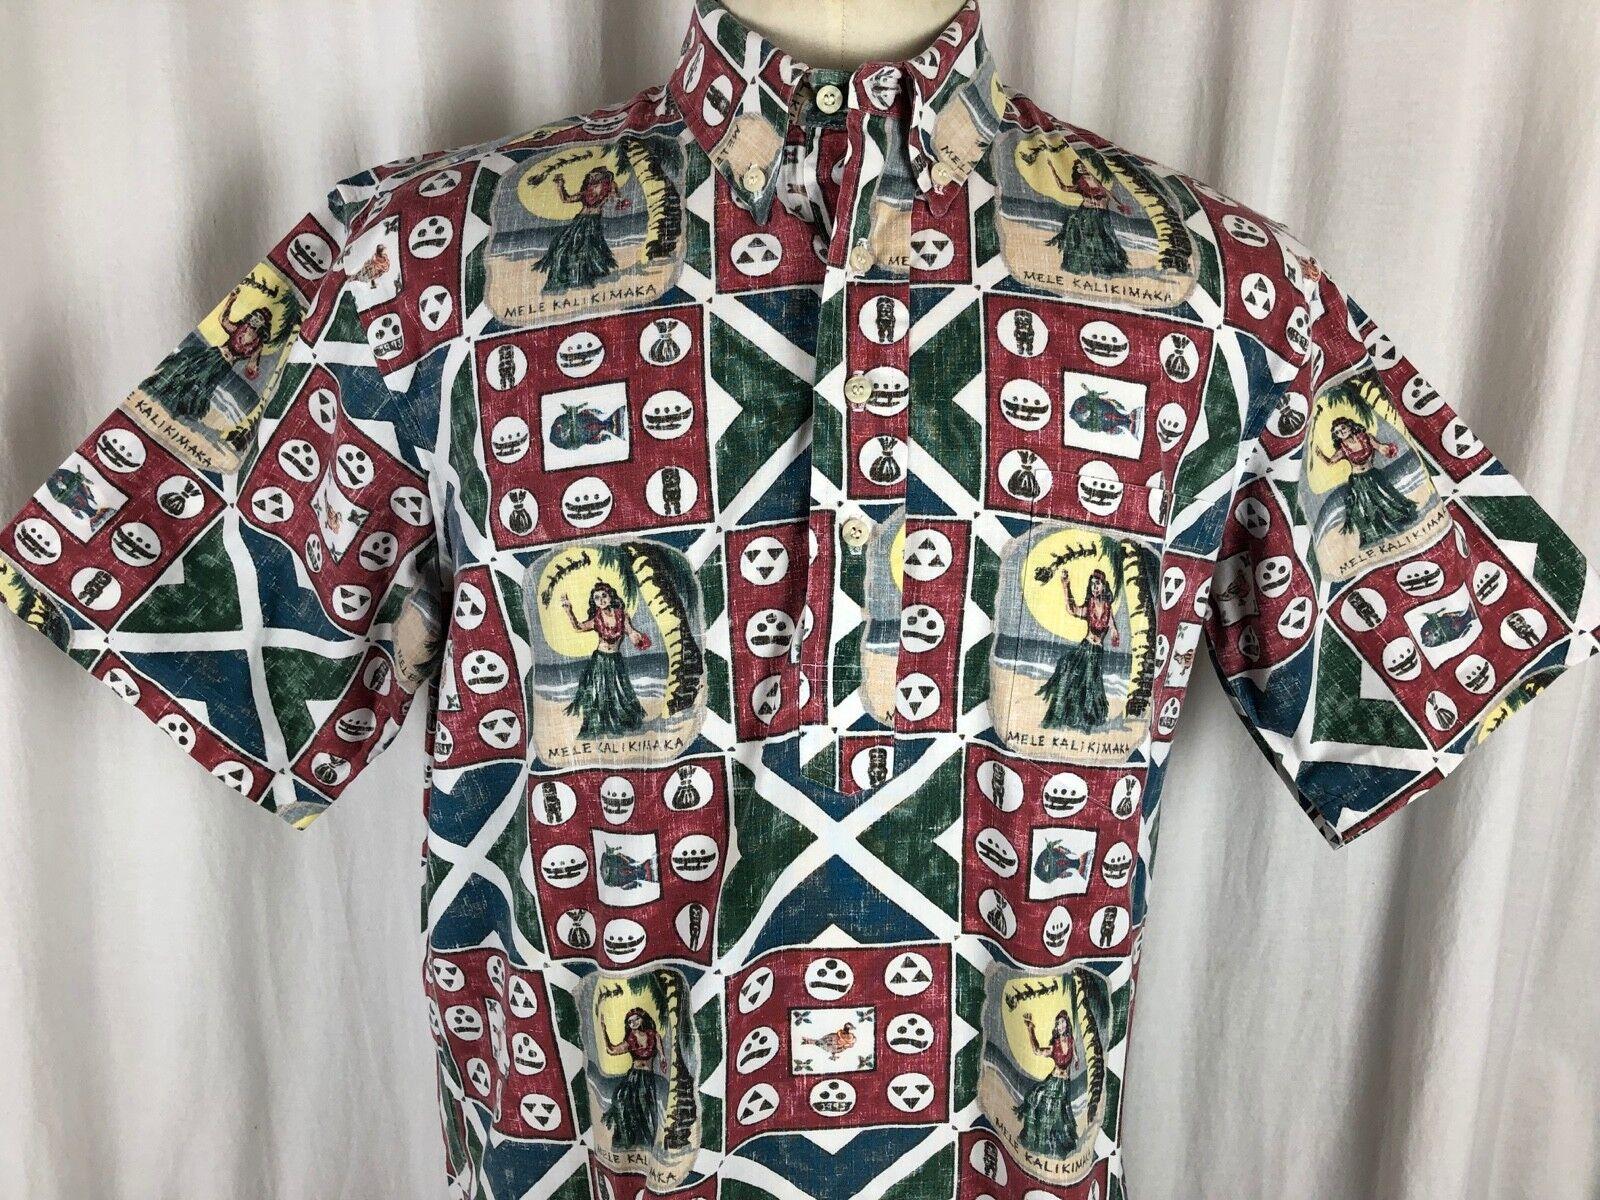 Reyn Spooner 1993 Mele Kalikimaka Christmas Shirt Size Large L Santa Holiday